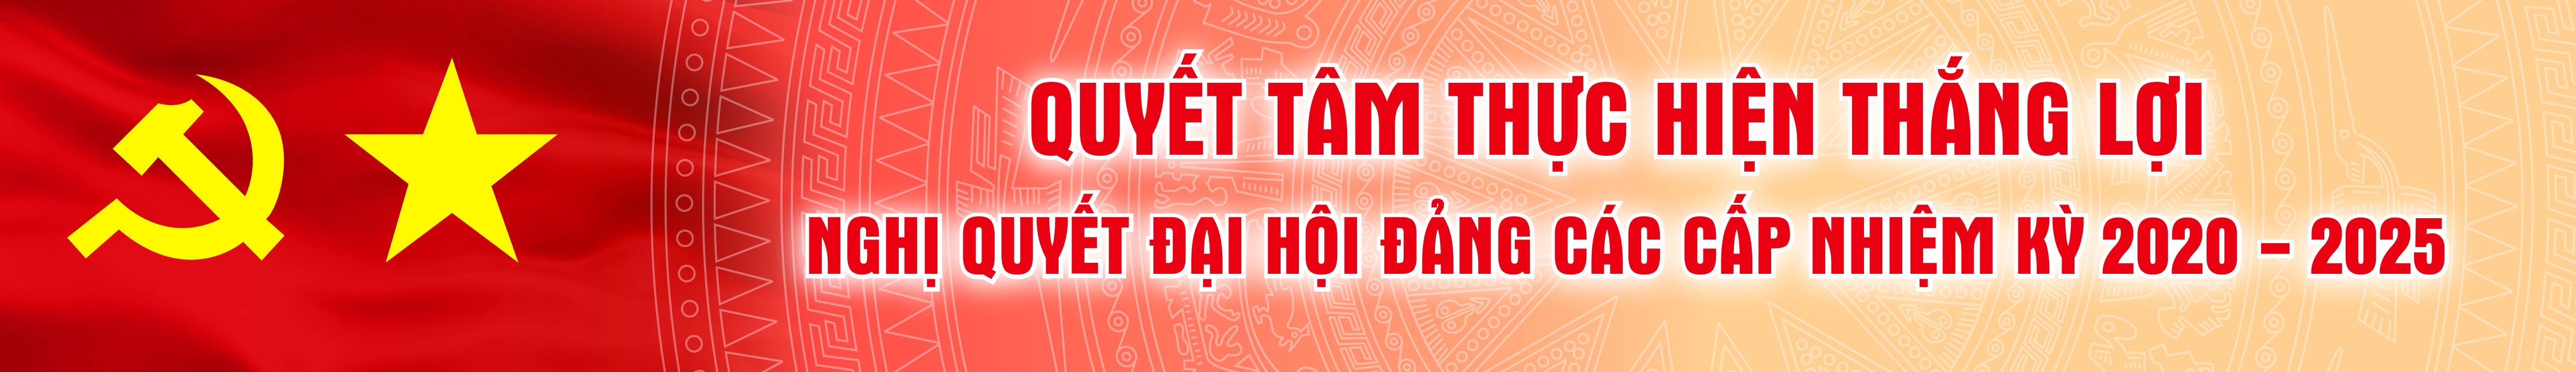 quyet-tam-thuc-hien-thang-loi-nghi-quyet-dai-hoi-dang-cac-cap